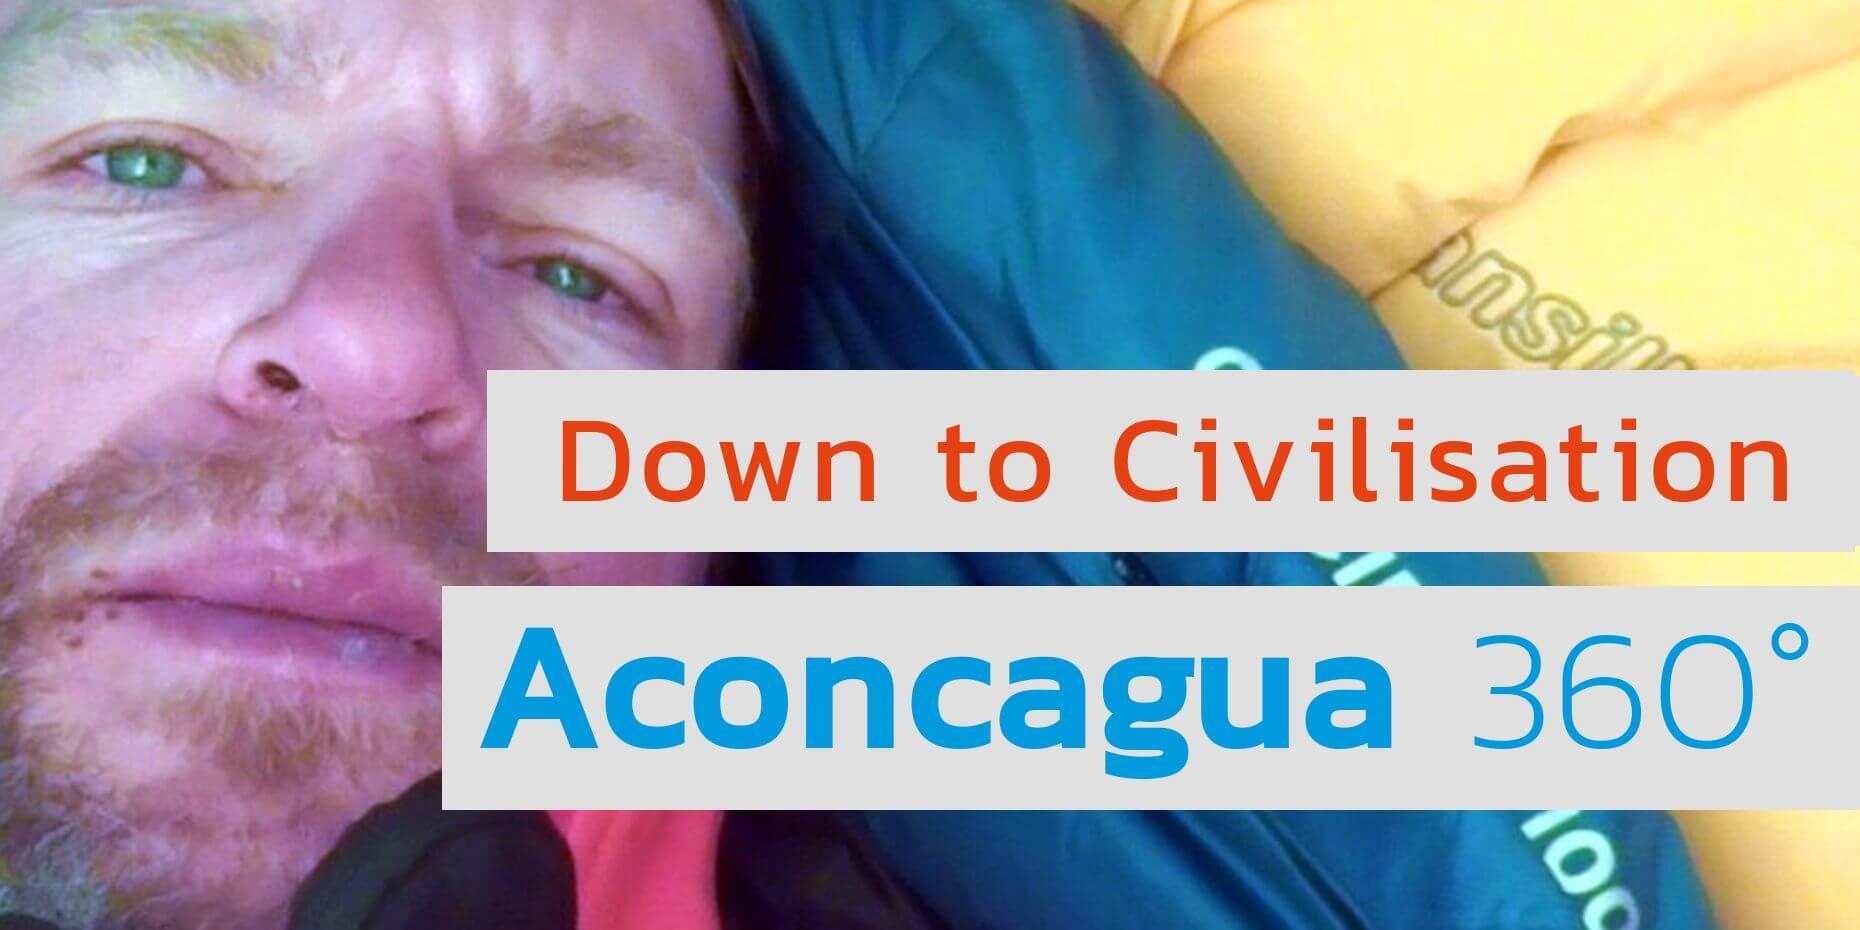 Video: Zurück vom Aconcagua-Gipfel - 7summits4help-Blog